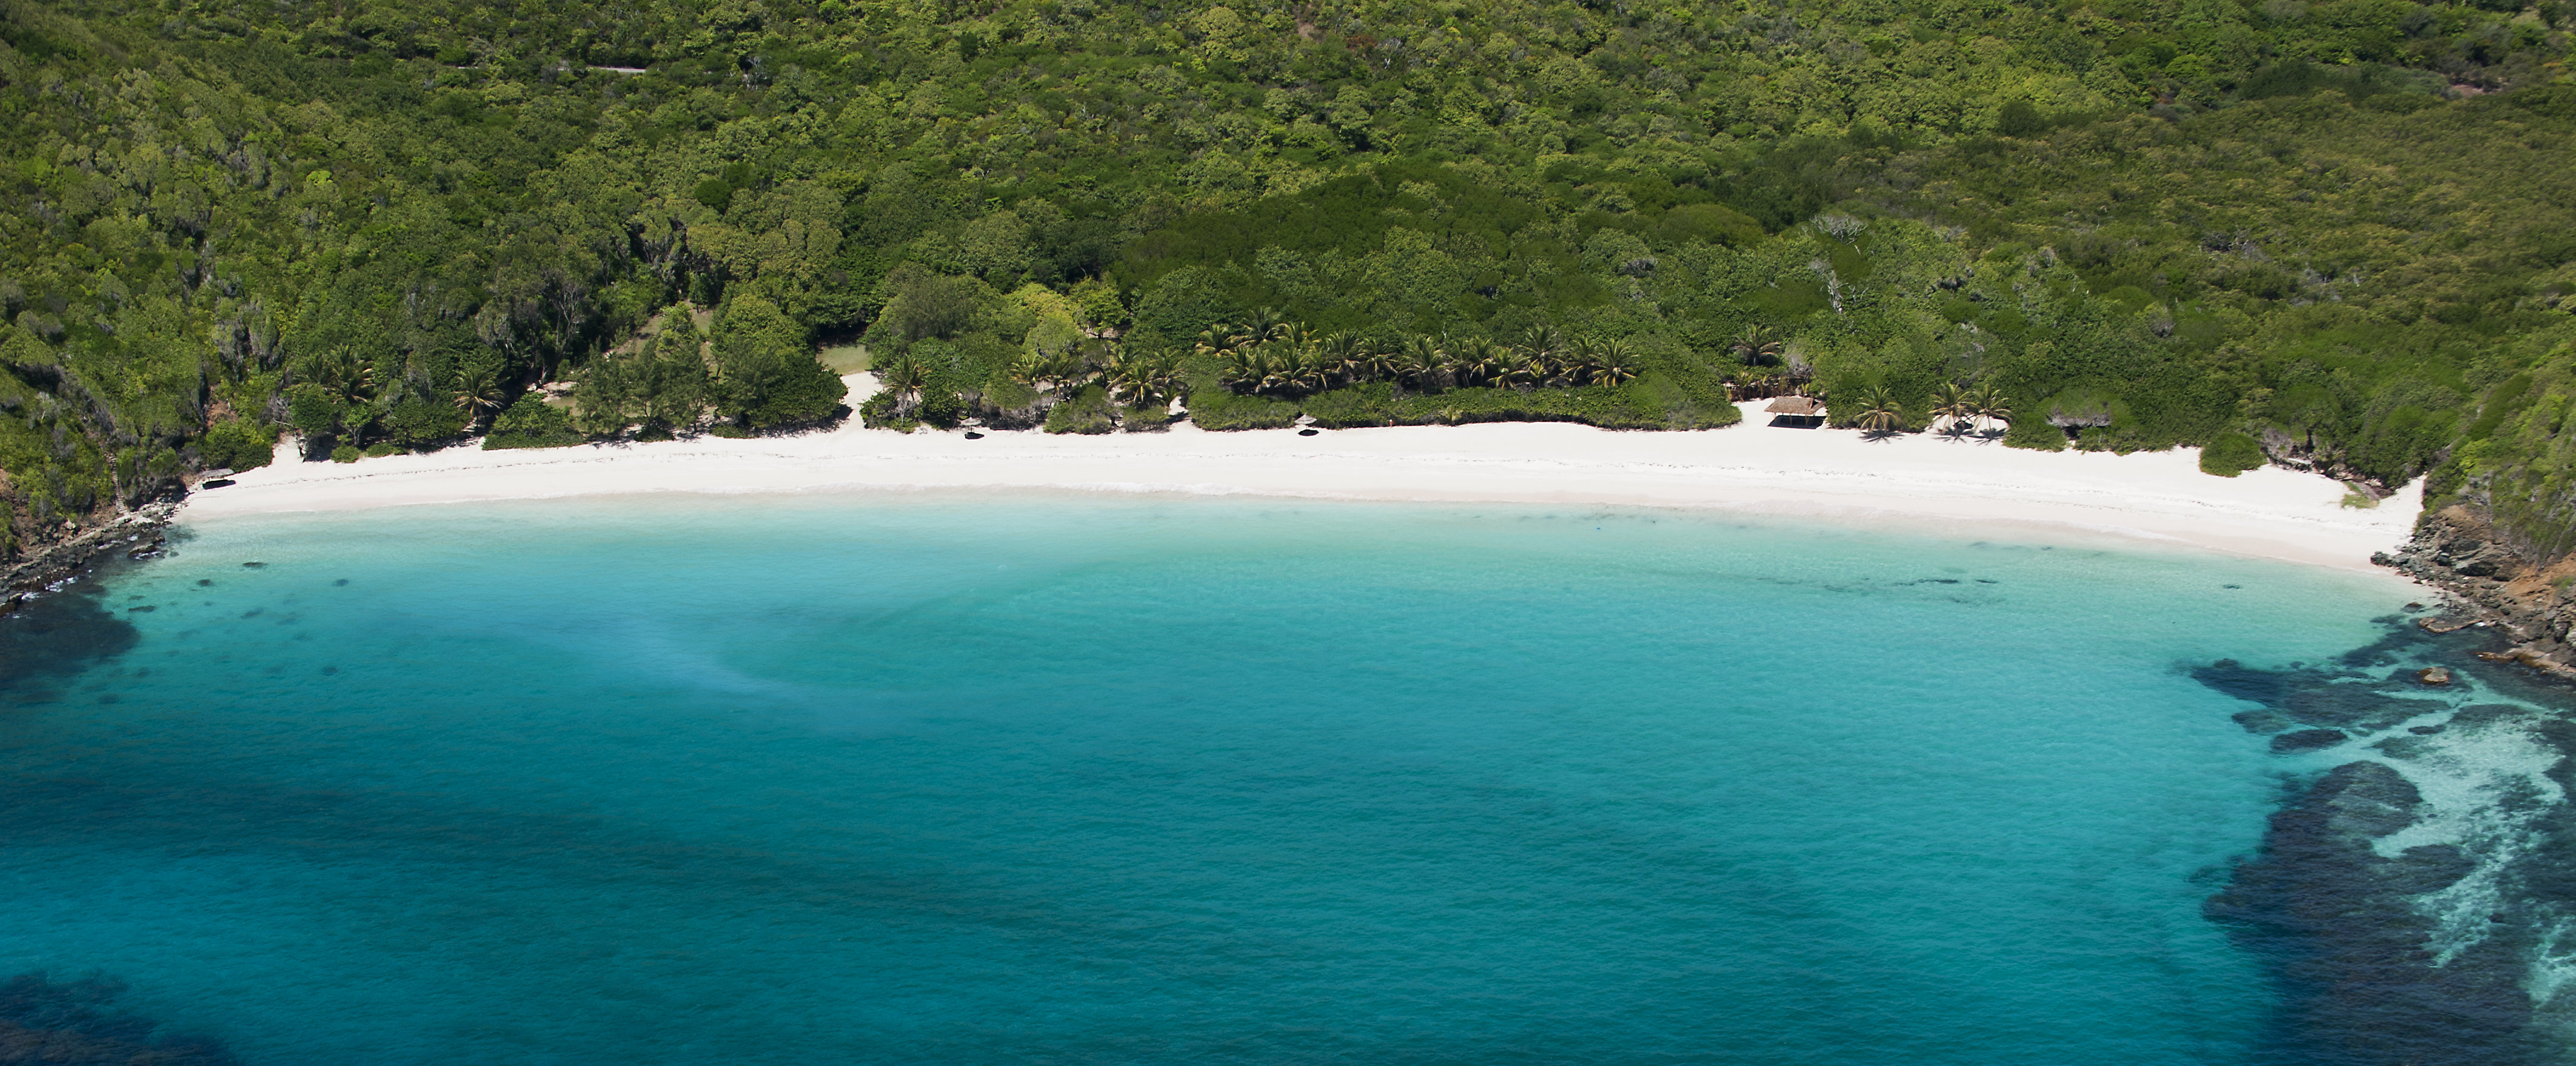 mustique-beach-aerial-view